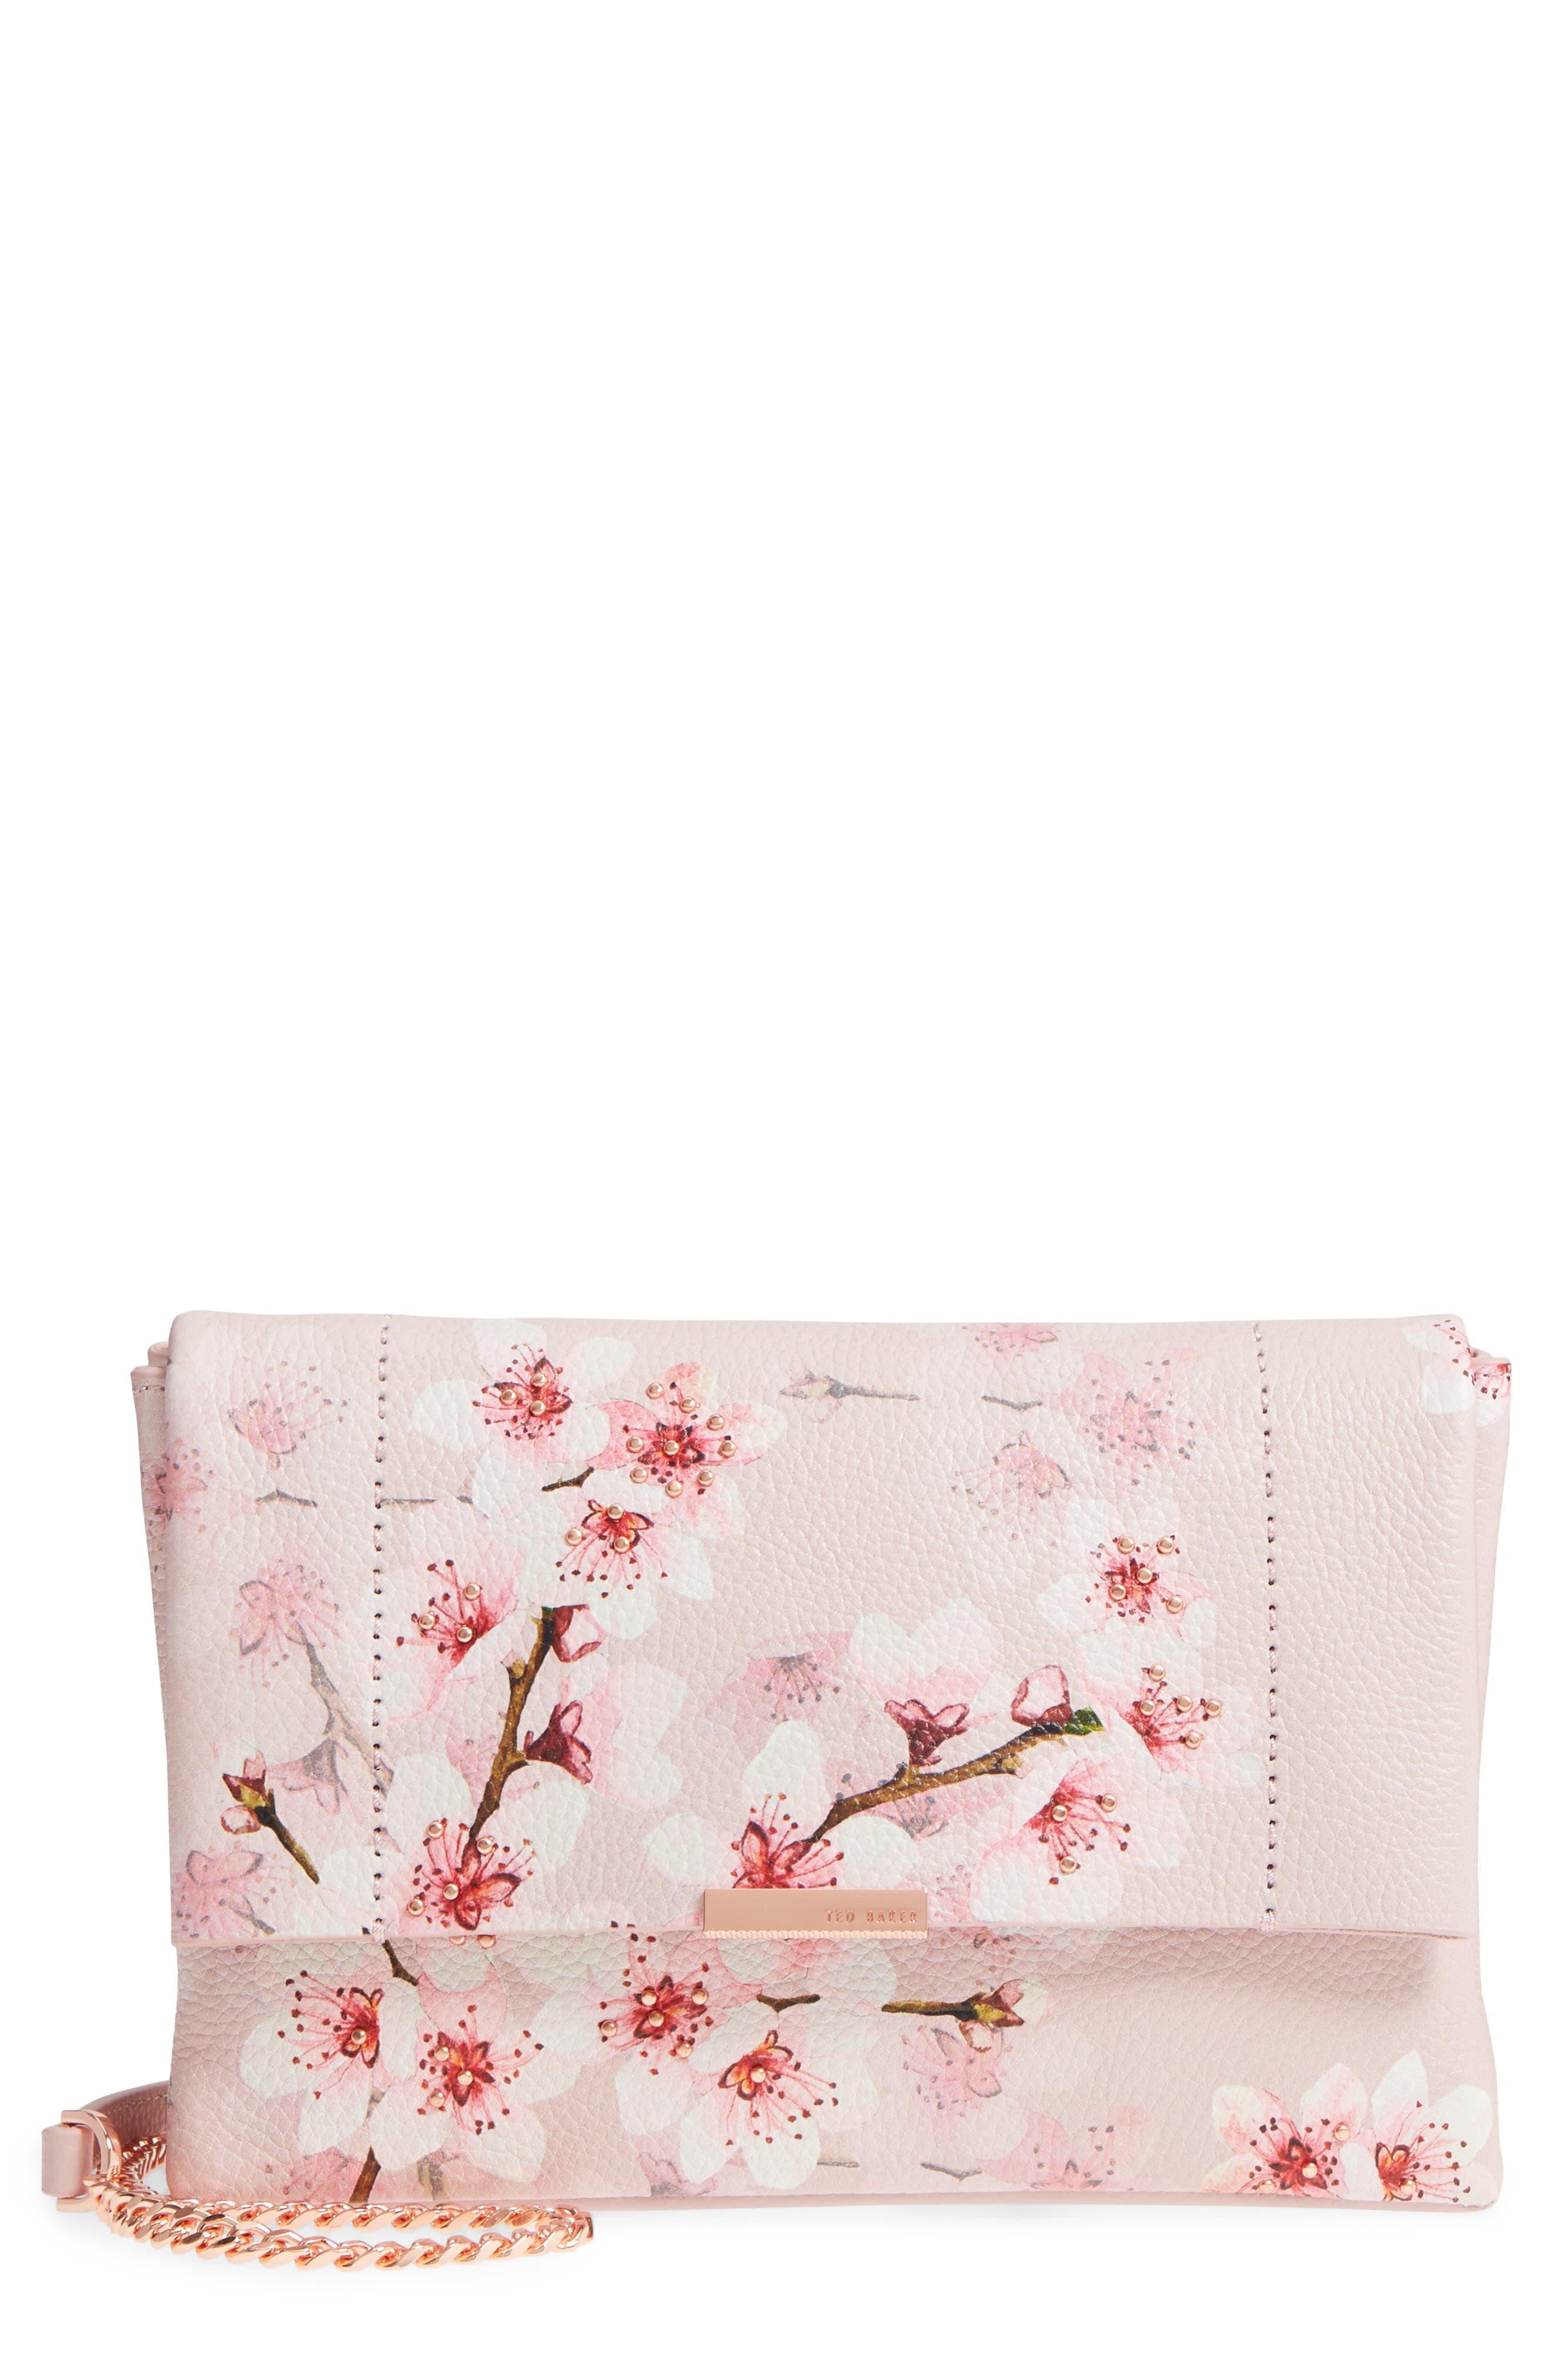 Main Image - Ted Baker London Jayy Soft Blossom Leather Crossbody Bag